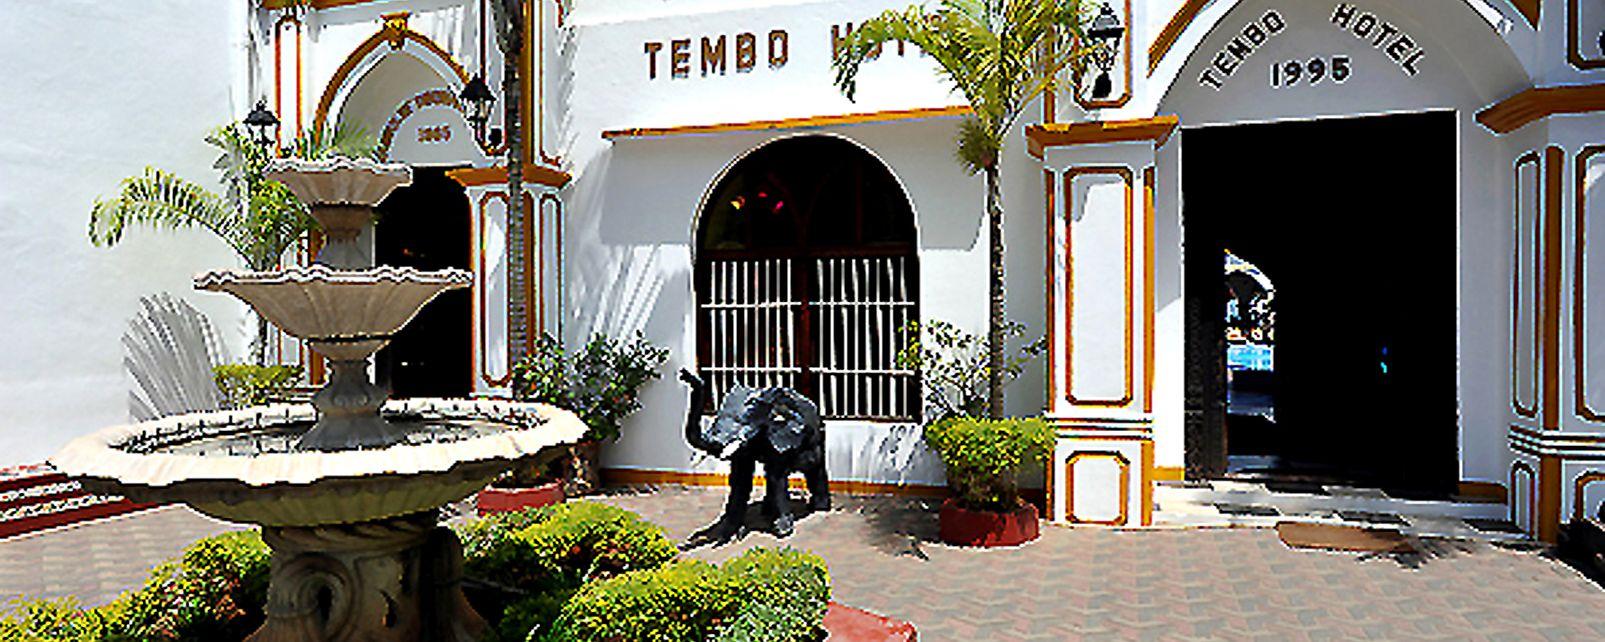 Hôtel Tembo House